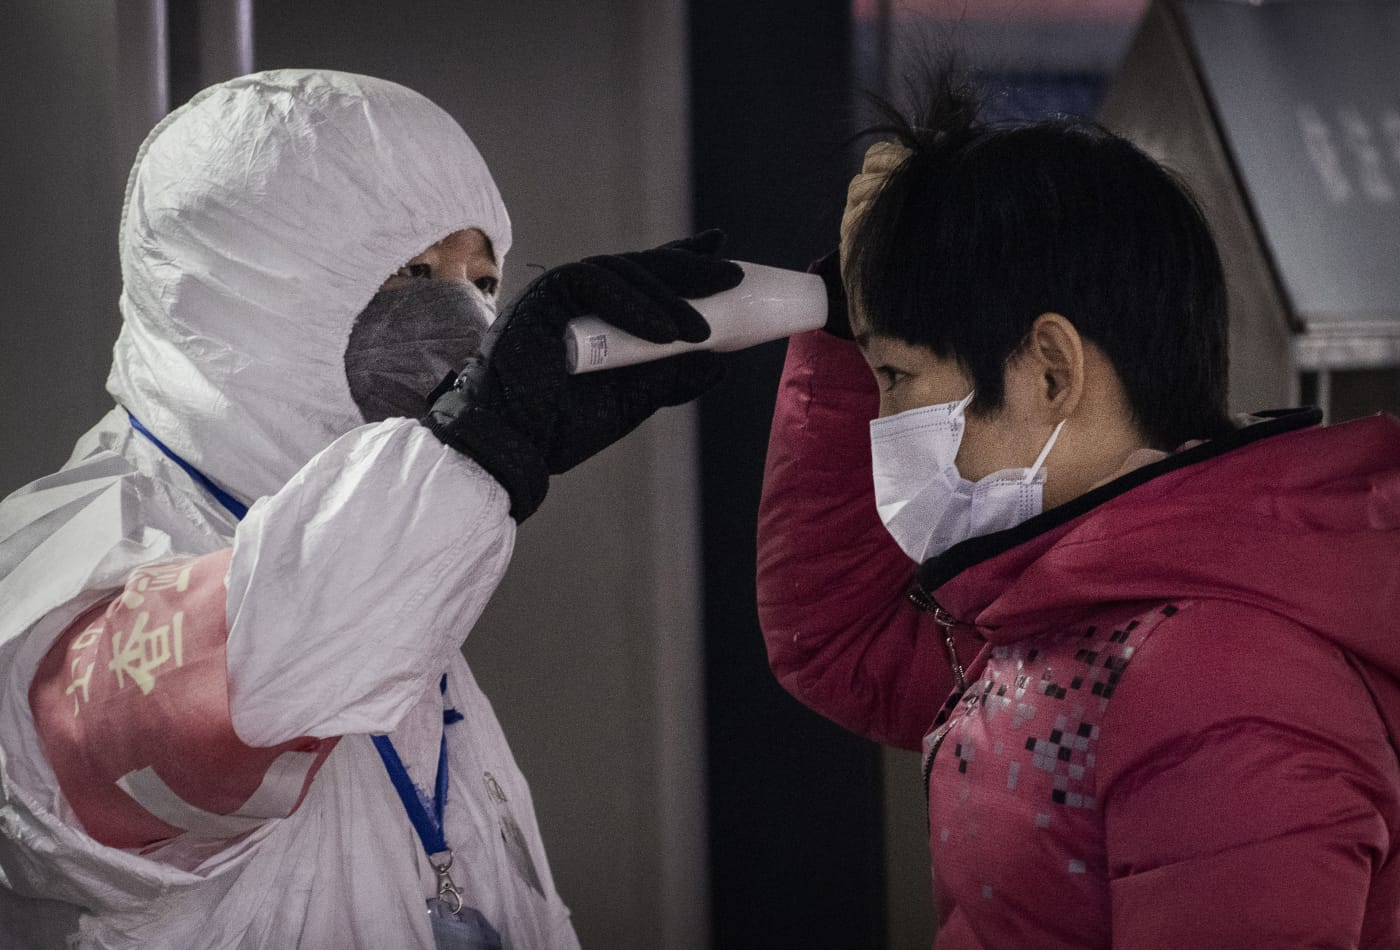 Fifth US case of coronavirus confirmed in Arizona, health officials say